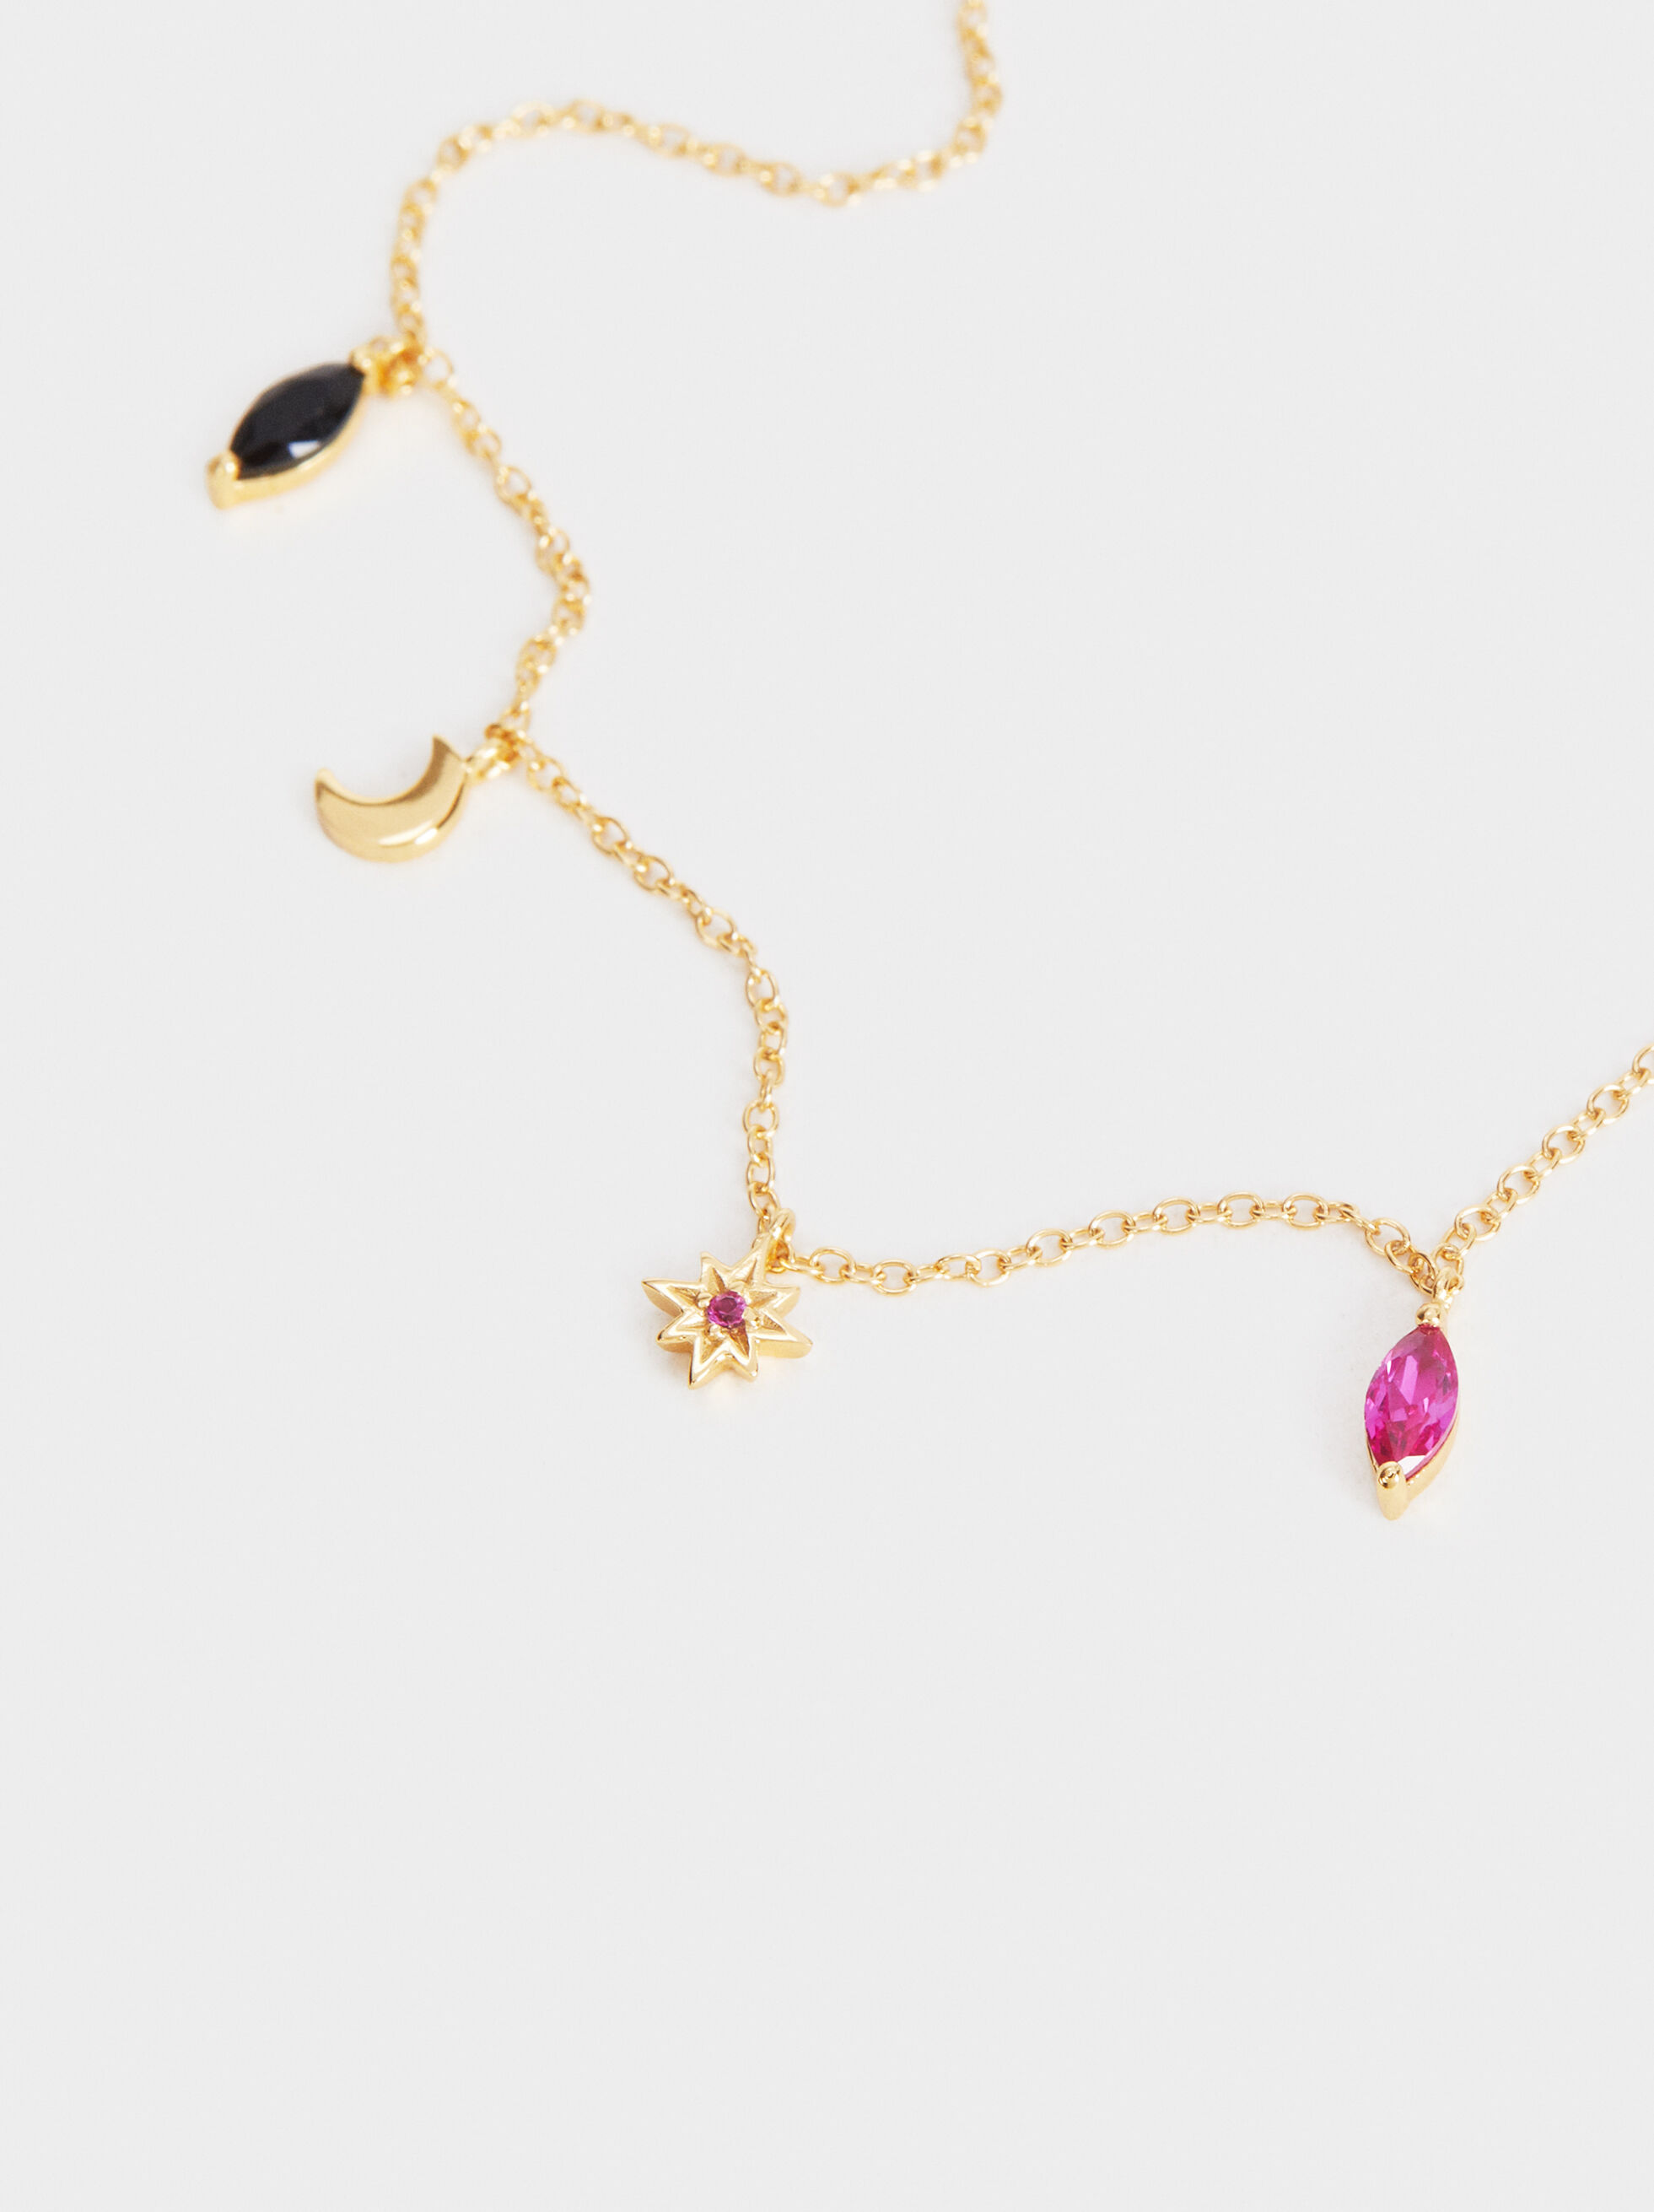 Short 925 Silver Necklace With Pendants, Multicolor, hi-res